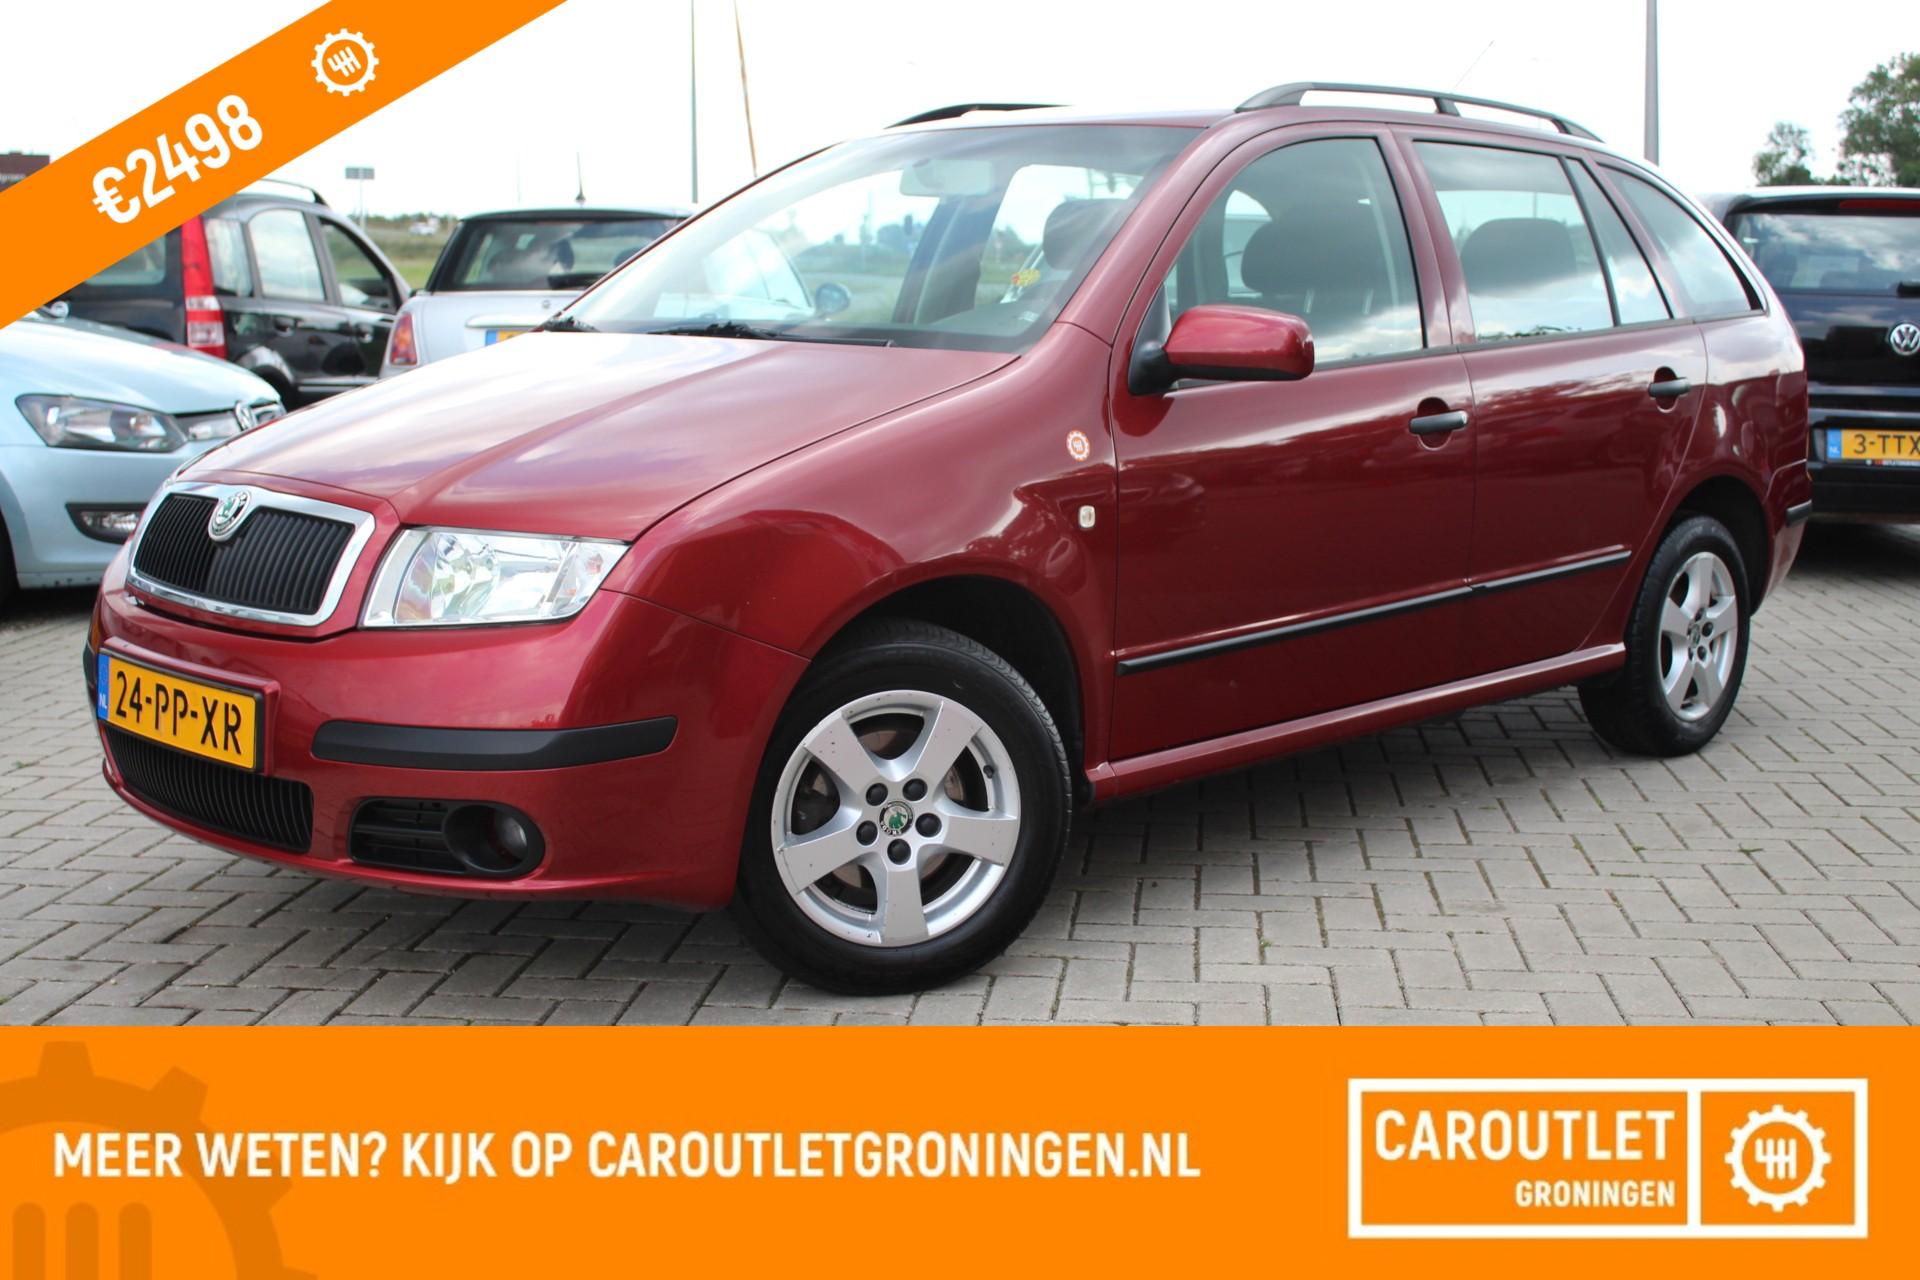 Caroutlet Groningen - Skoda Fabia Combi 1.4-16V Comfort | AIRCO | CRUISE | 2004